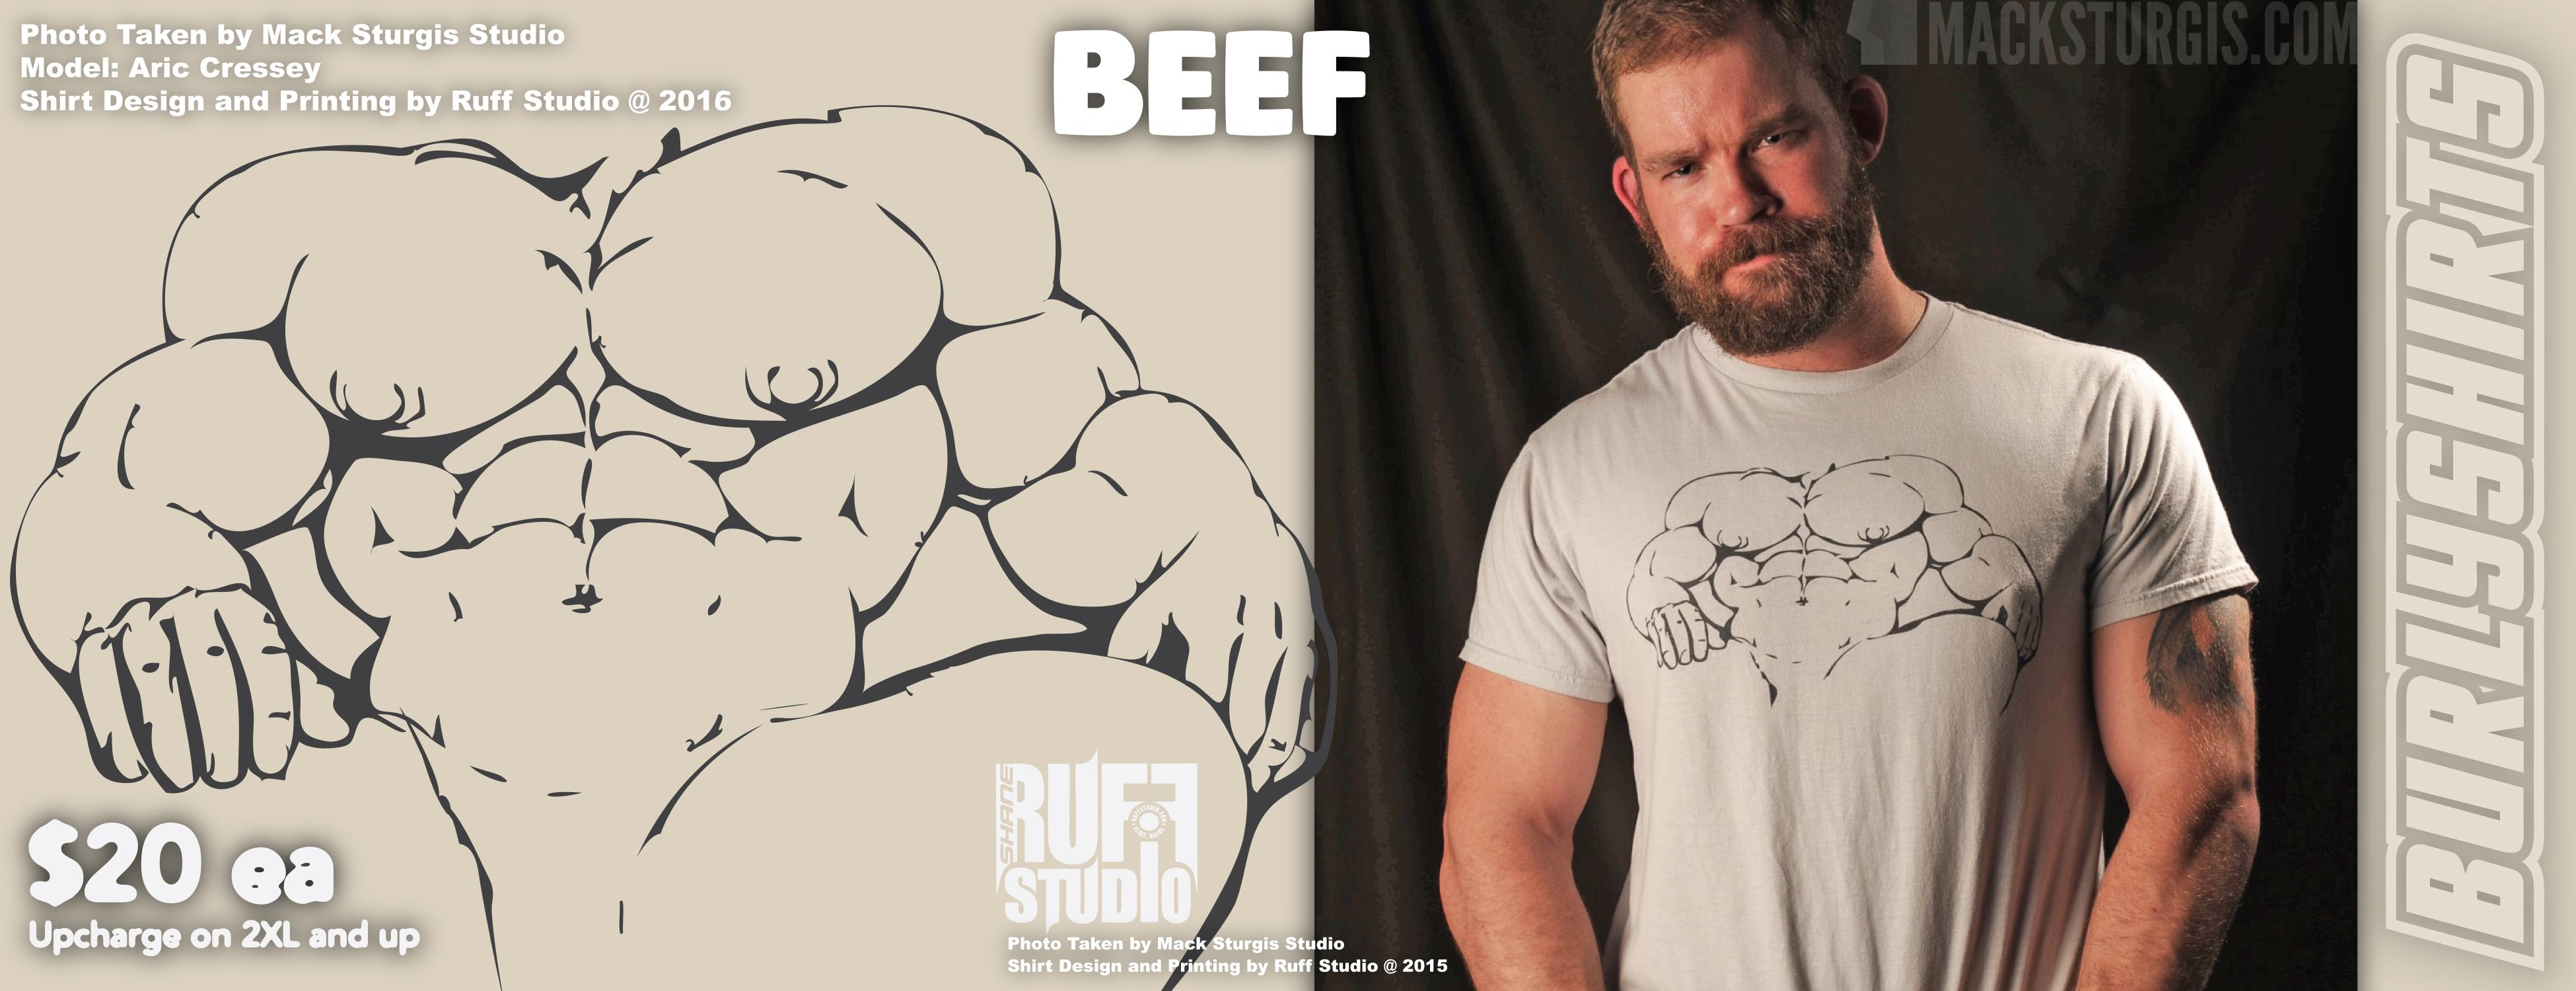 beef-ad-1a.jpg